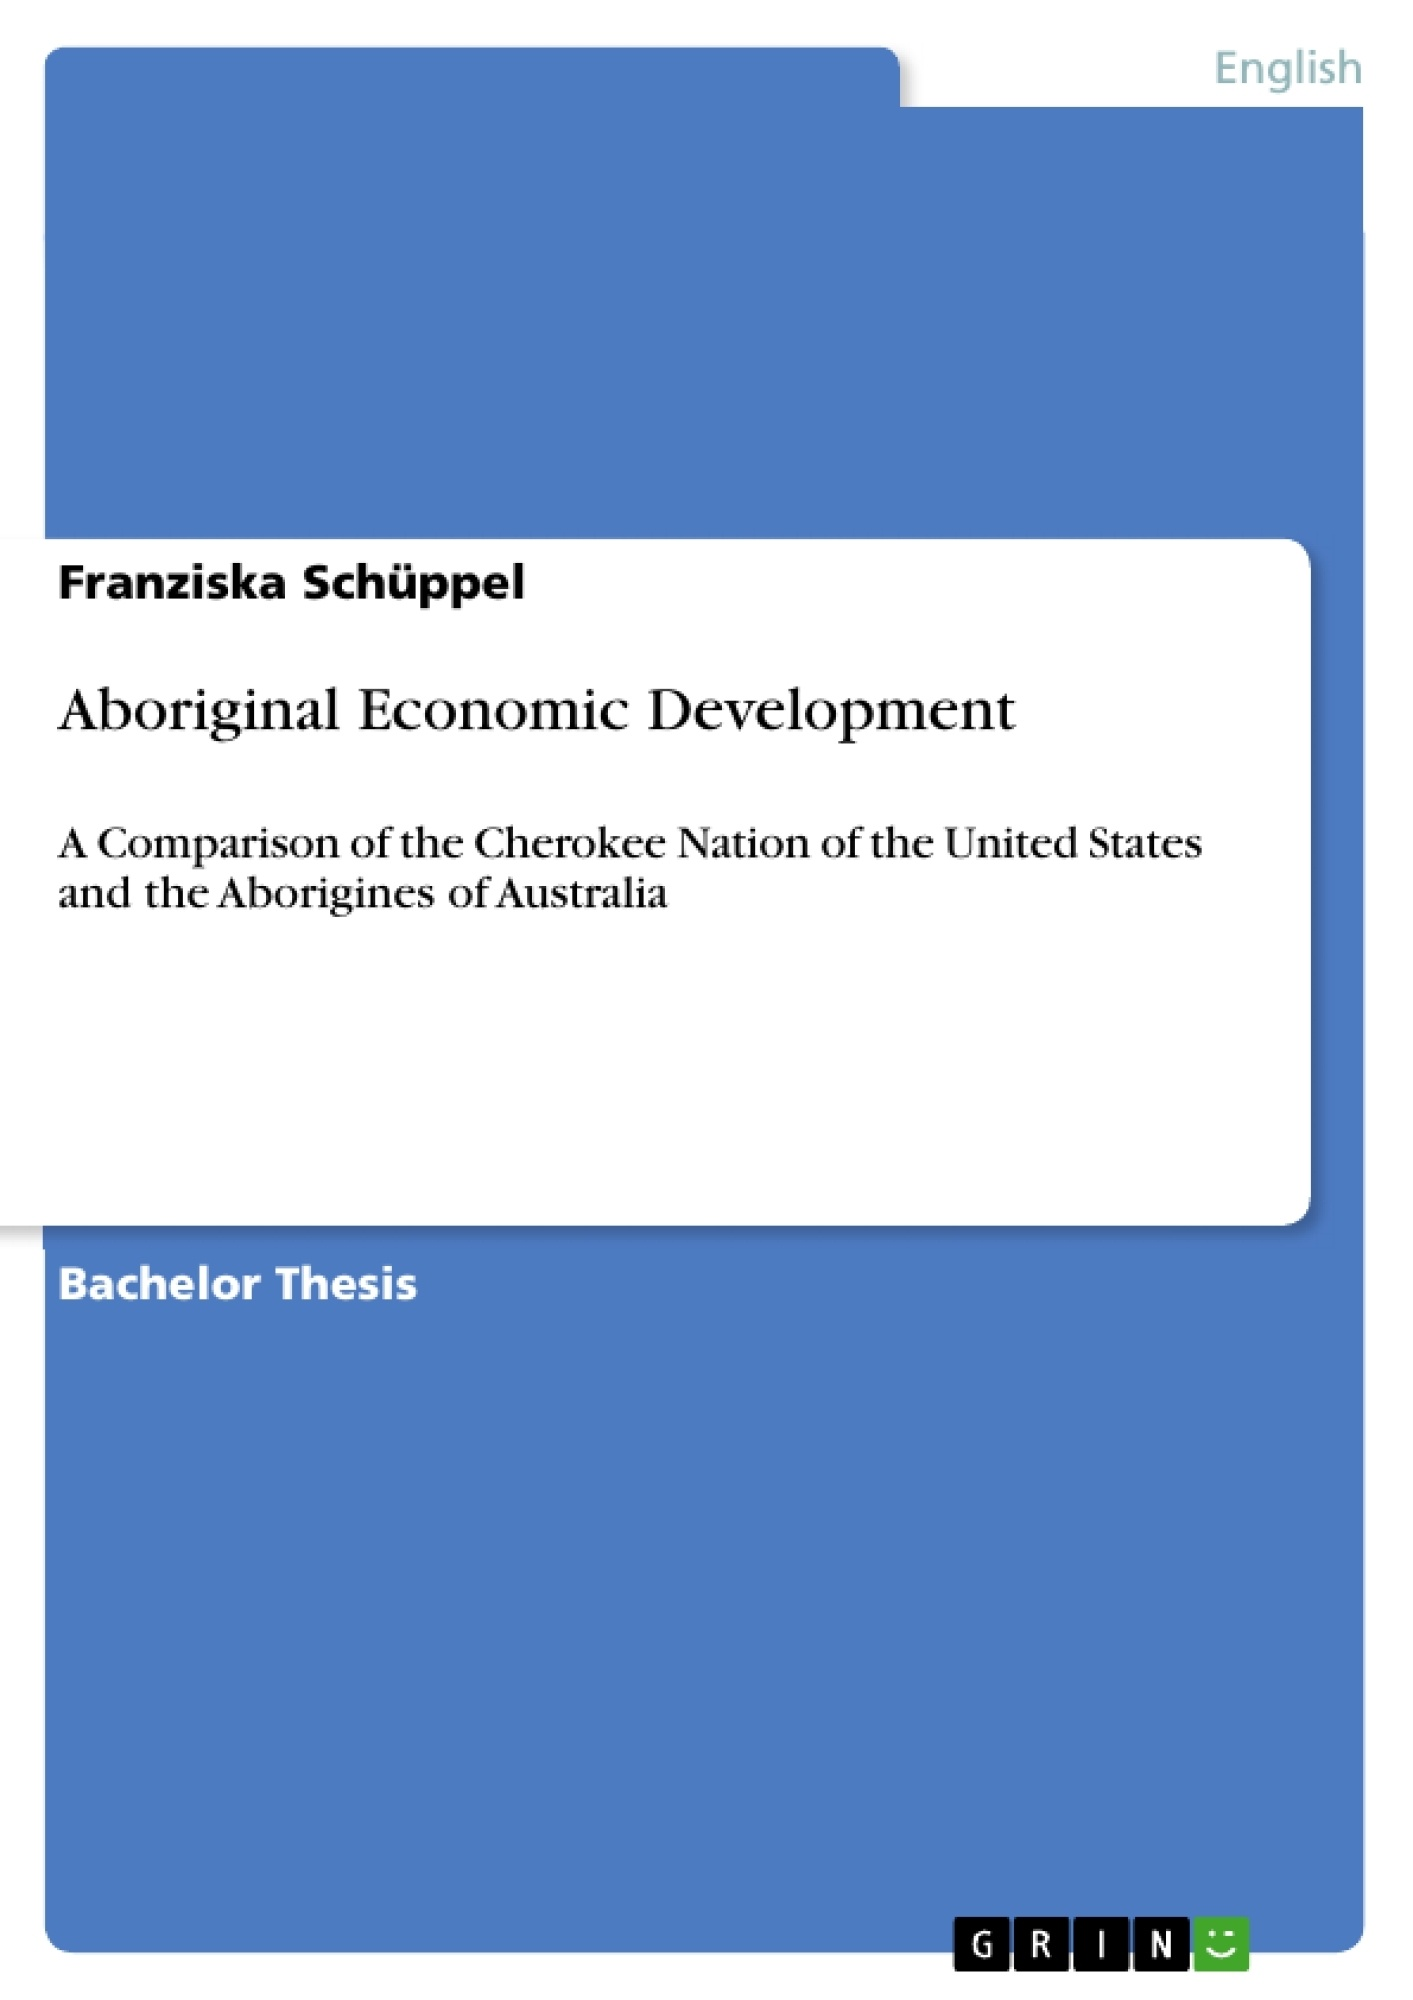 Title: Aboriginal Economic Development